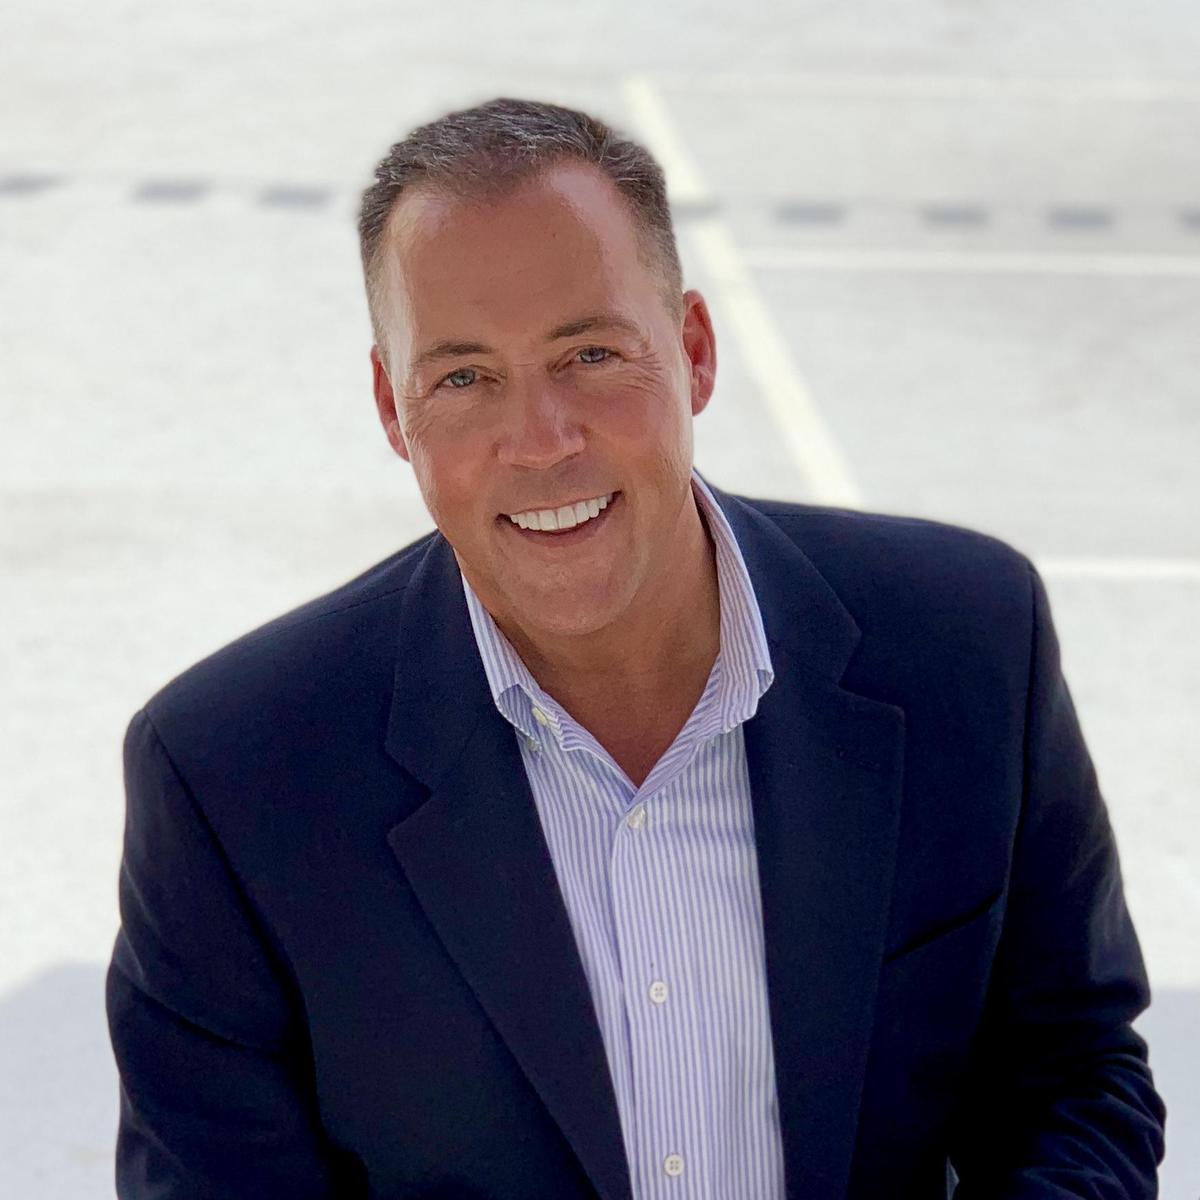 Dr. Michael Bregy